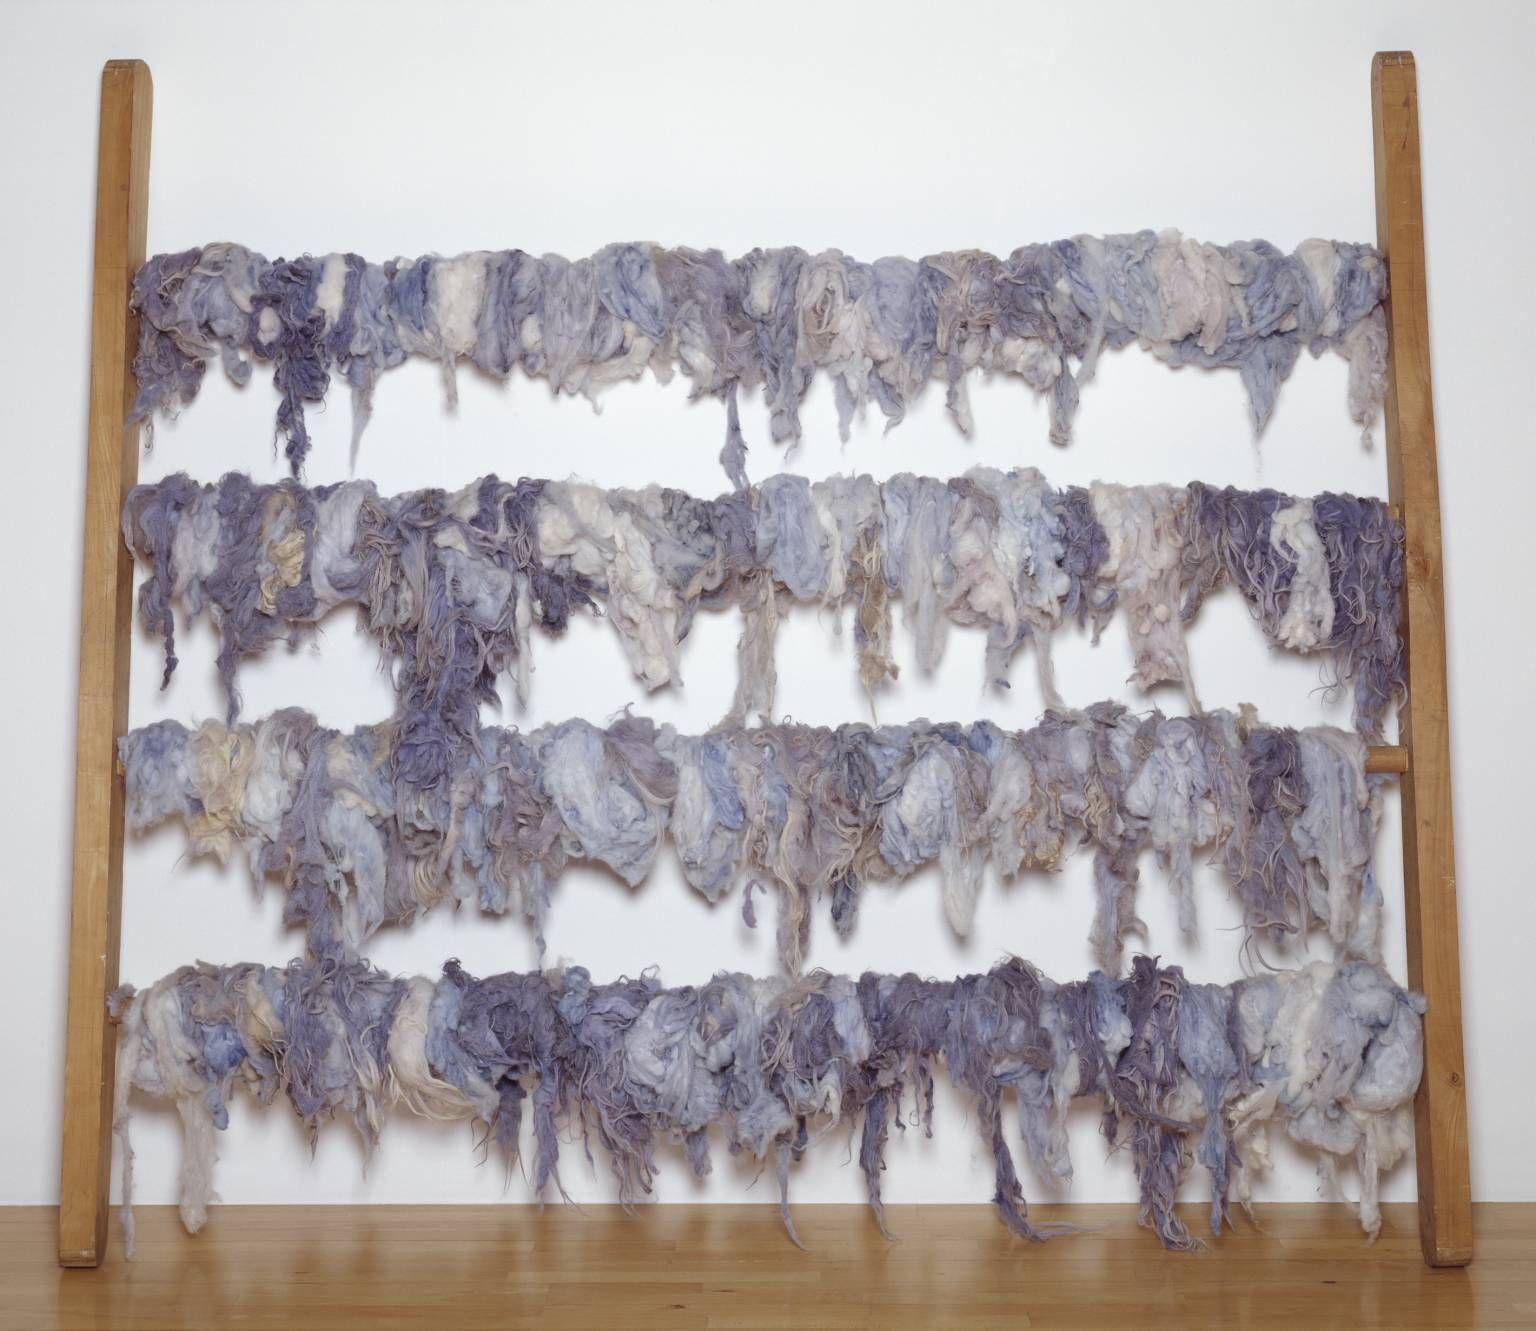 'Untitled', Jannis Kounellis, 1968